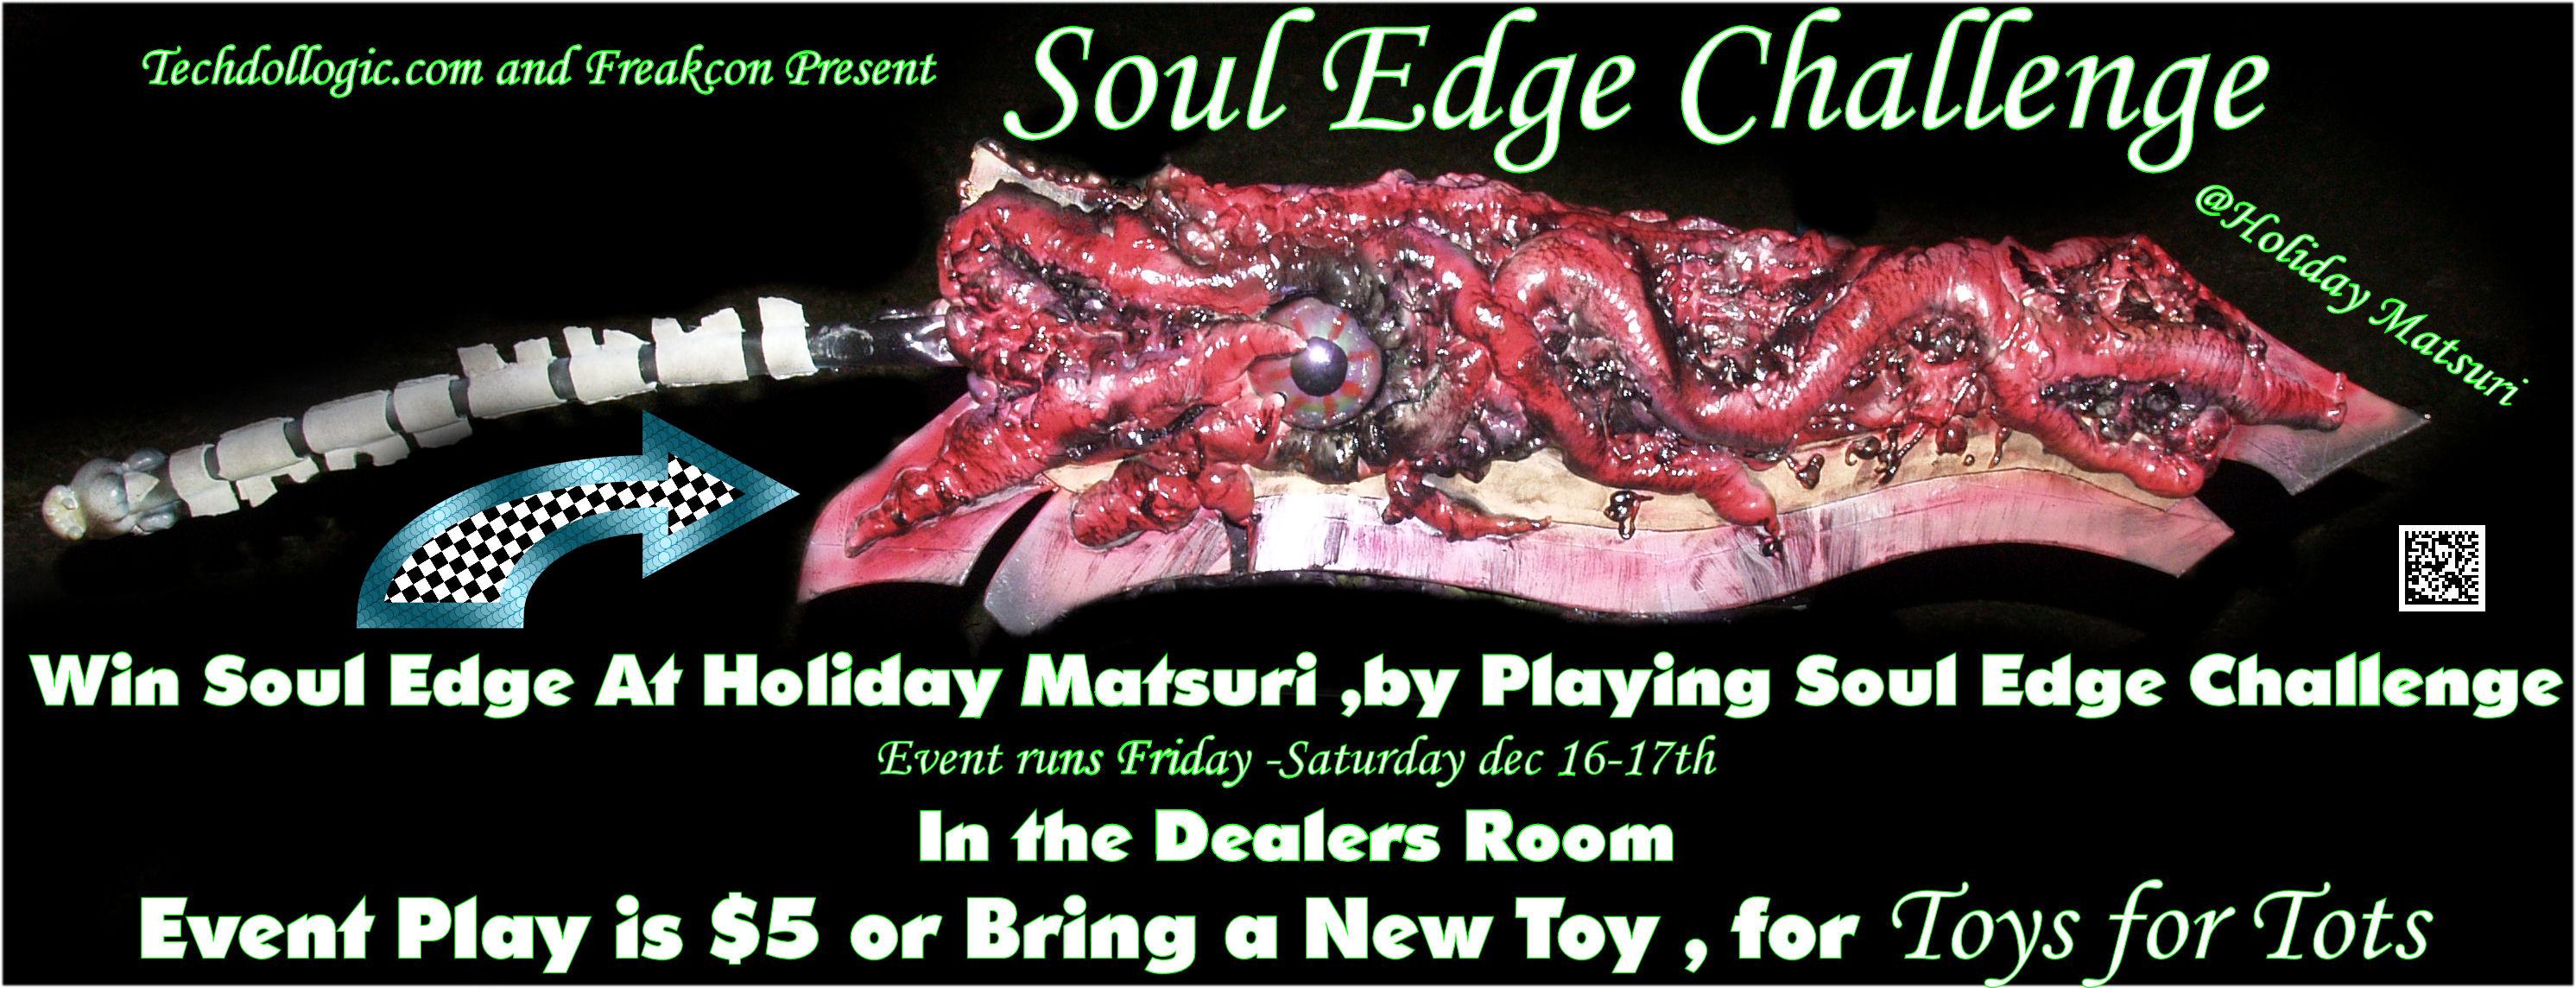 Soul Edge helps children